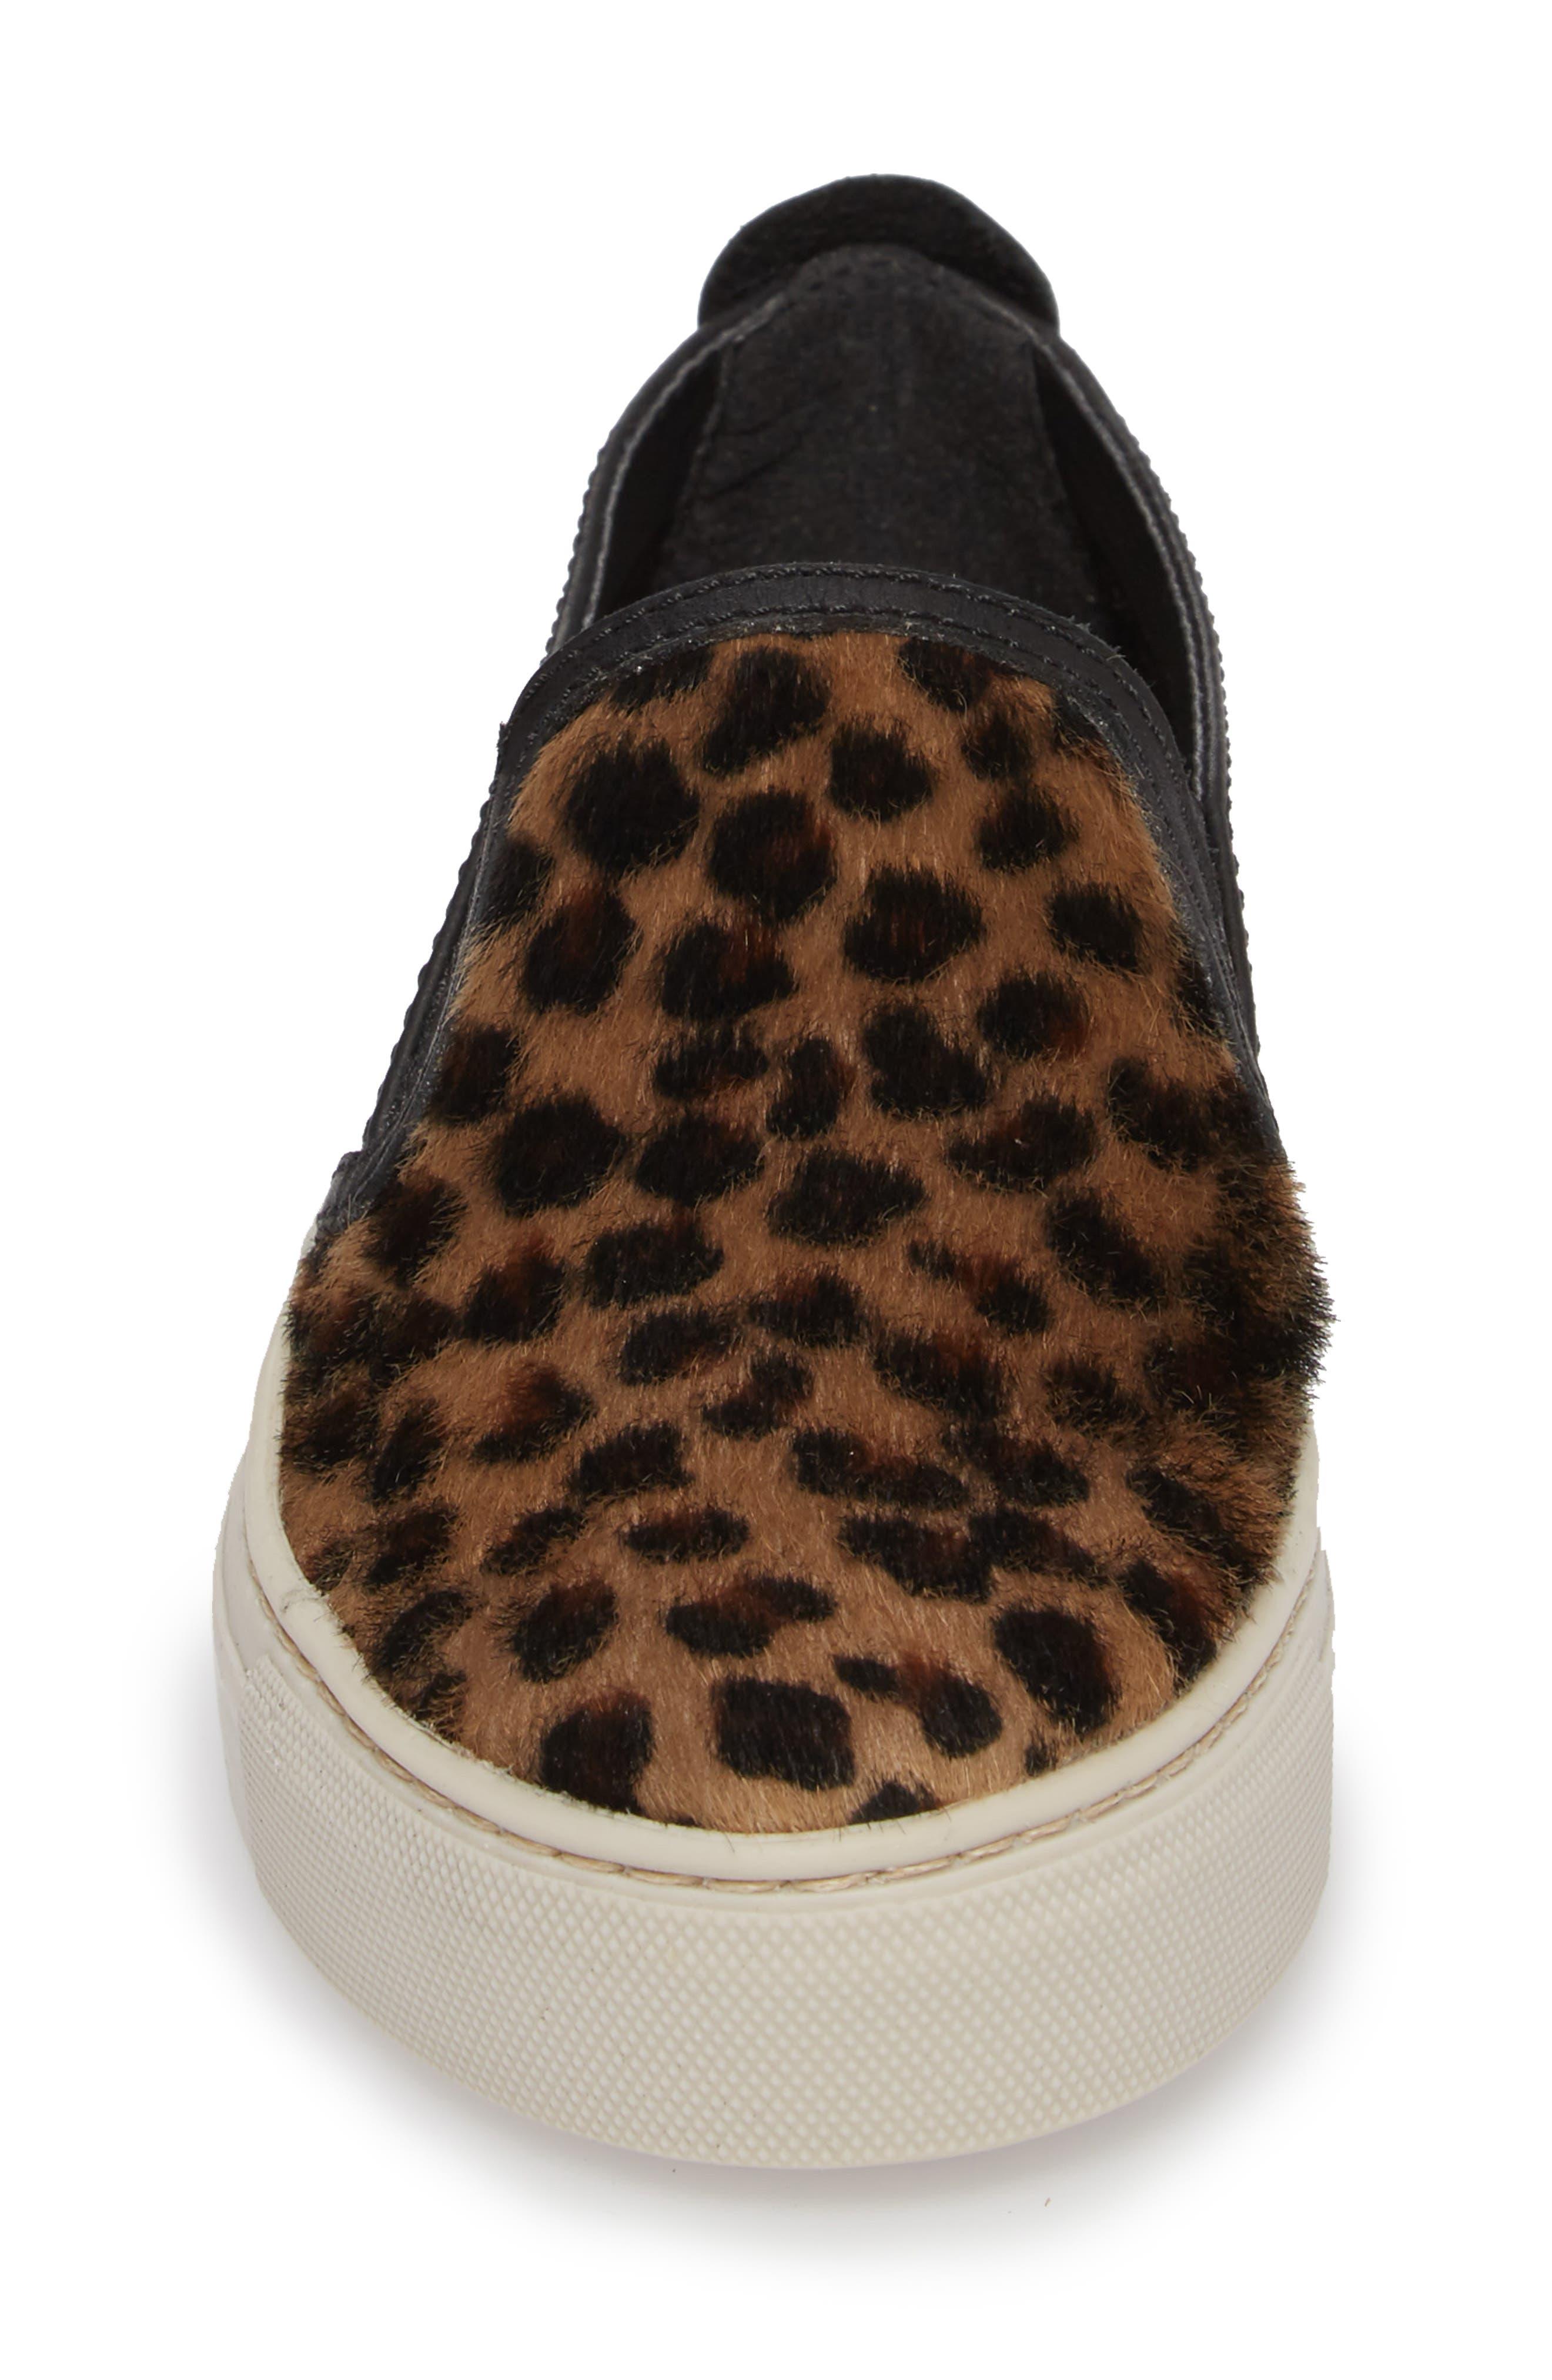 Sneak About Slip-On Sneaker,                             Alternate thumbnail 4, color,                             001